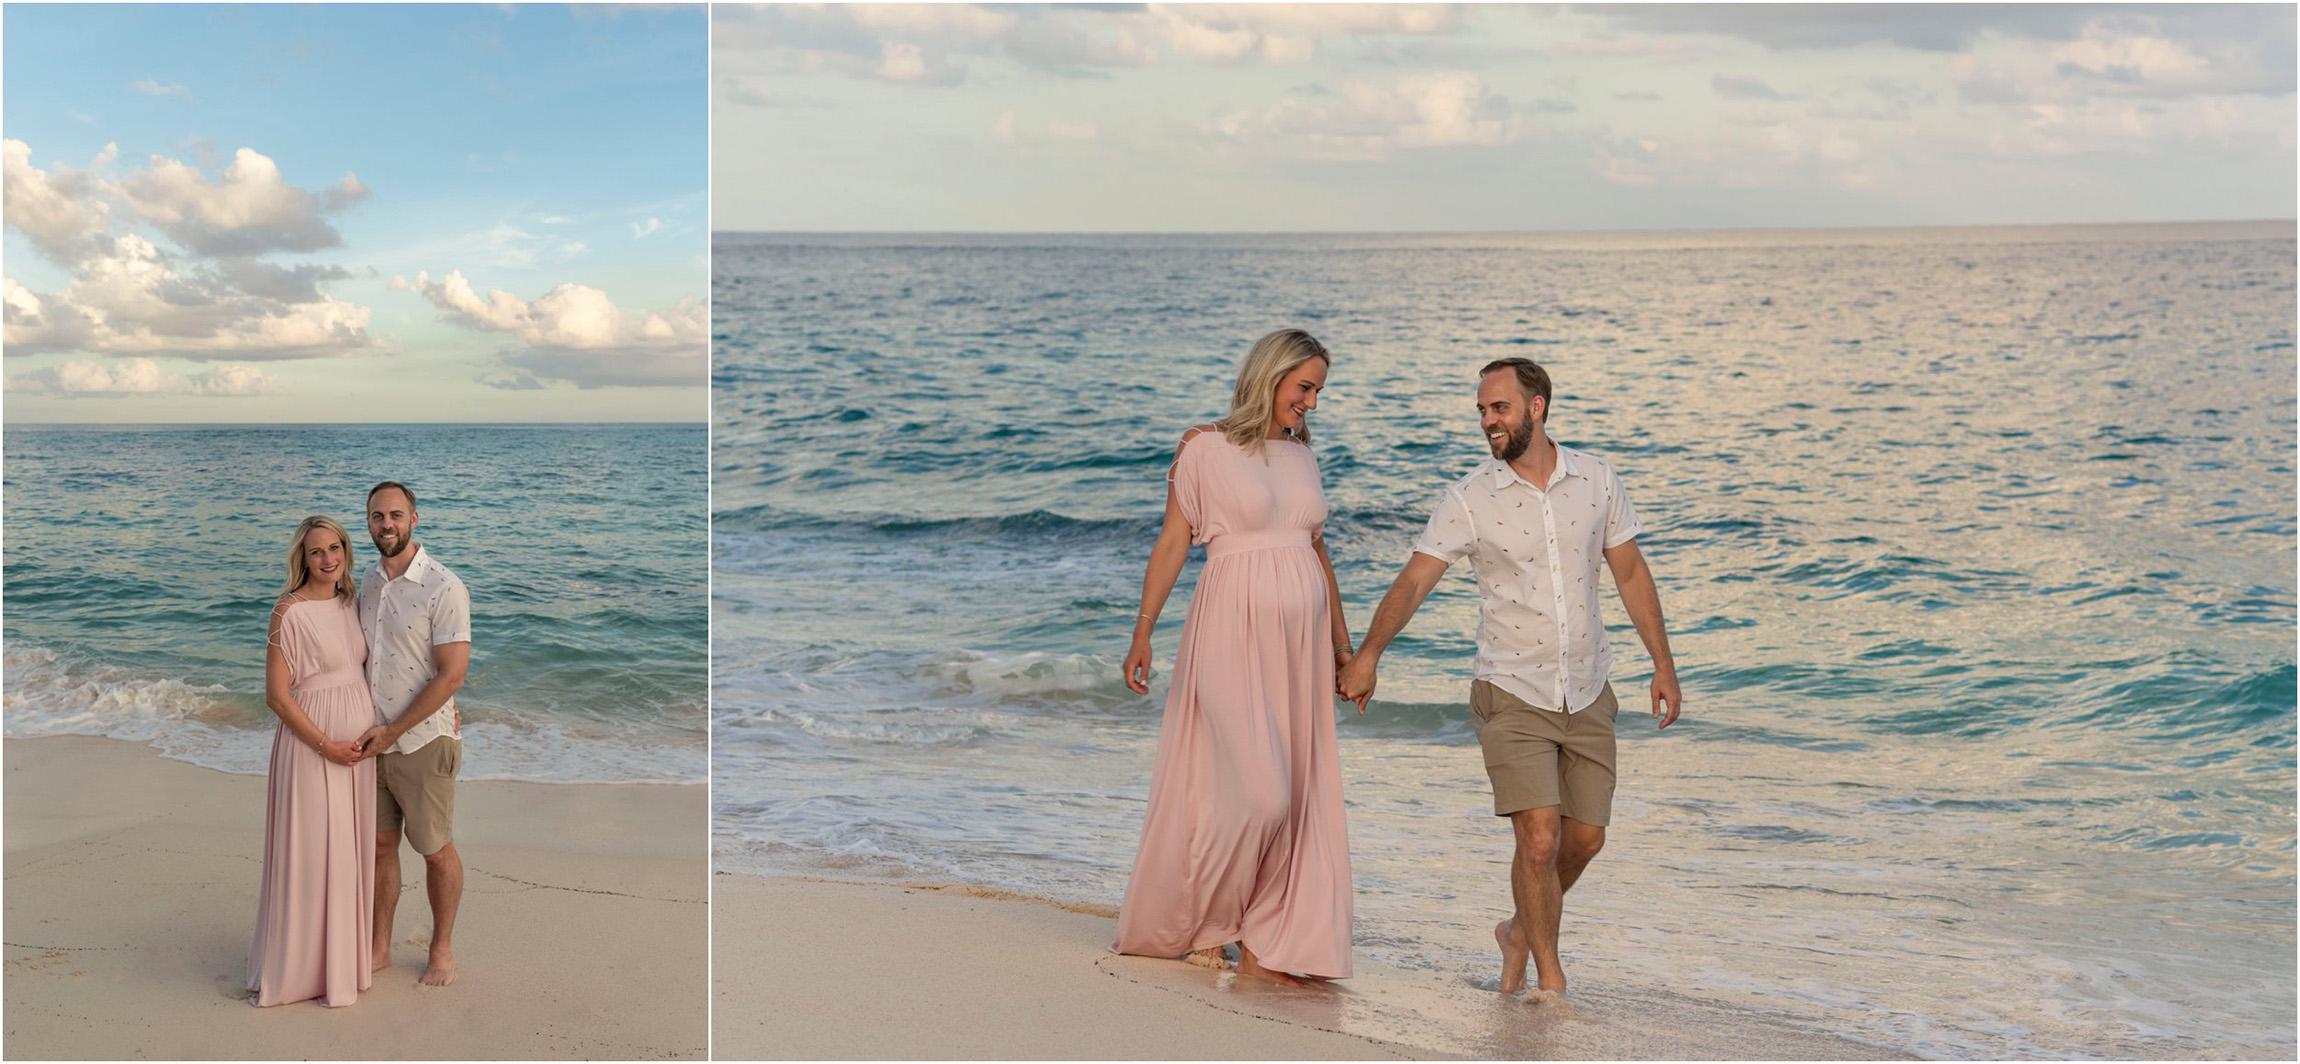 ©FianderFoto_Bermuda_Tom Moore's Jungle_Proposal Maternity Photographer_Erika_Andy_026.jpg